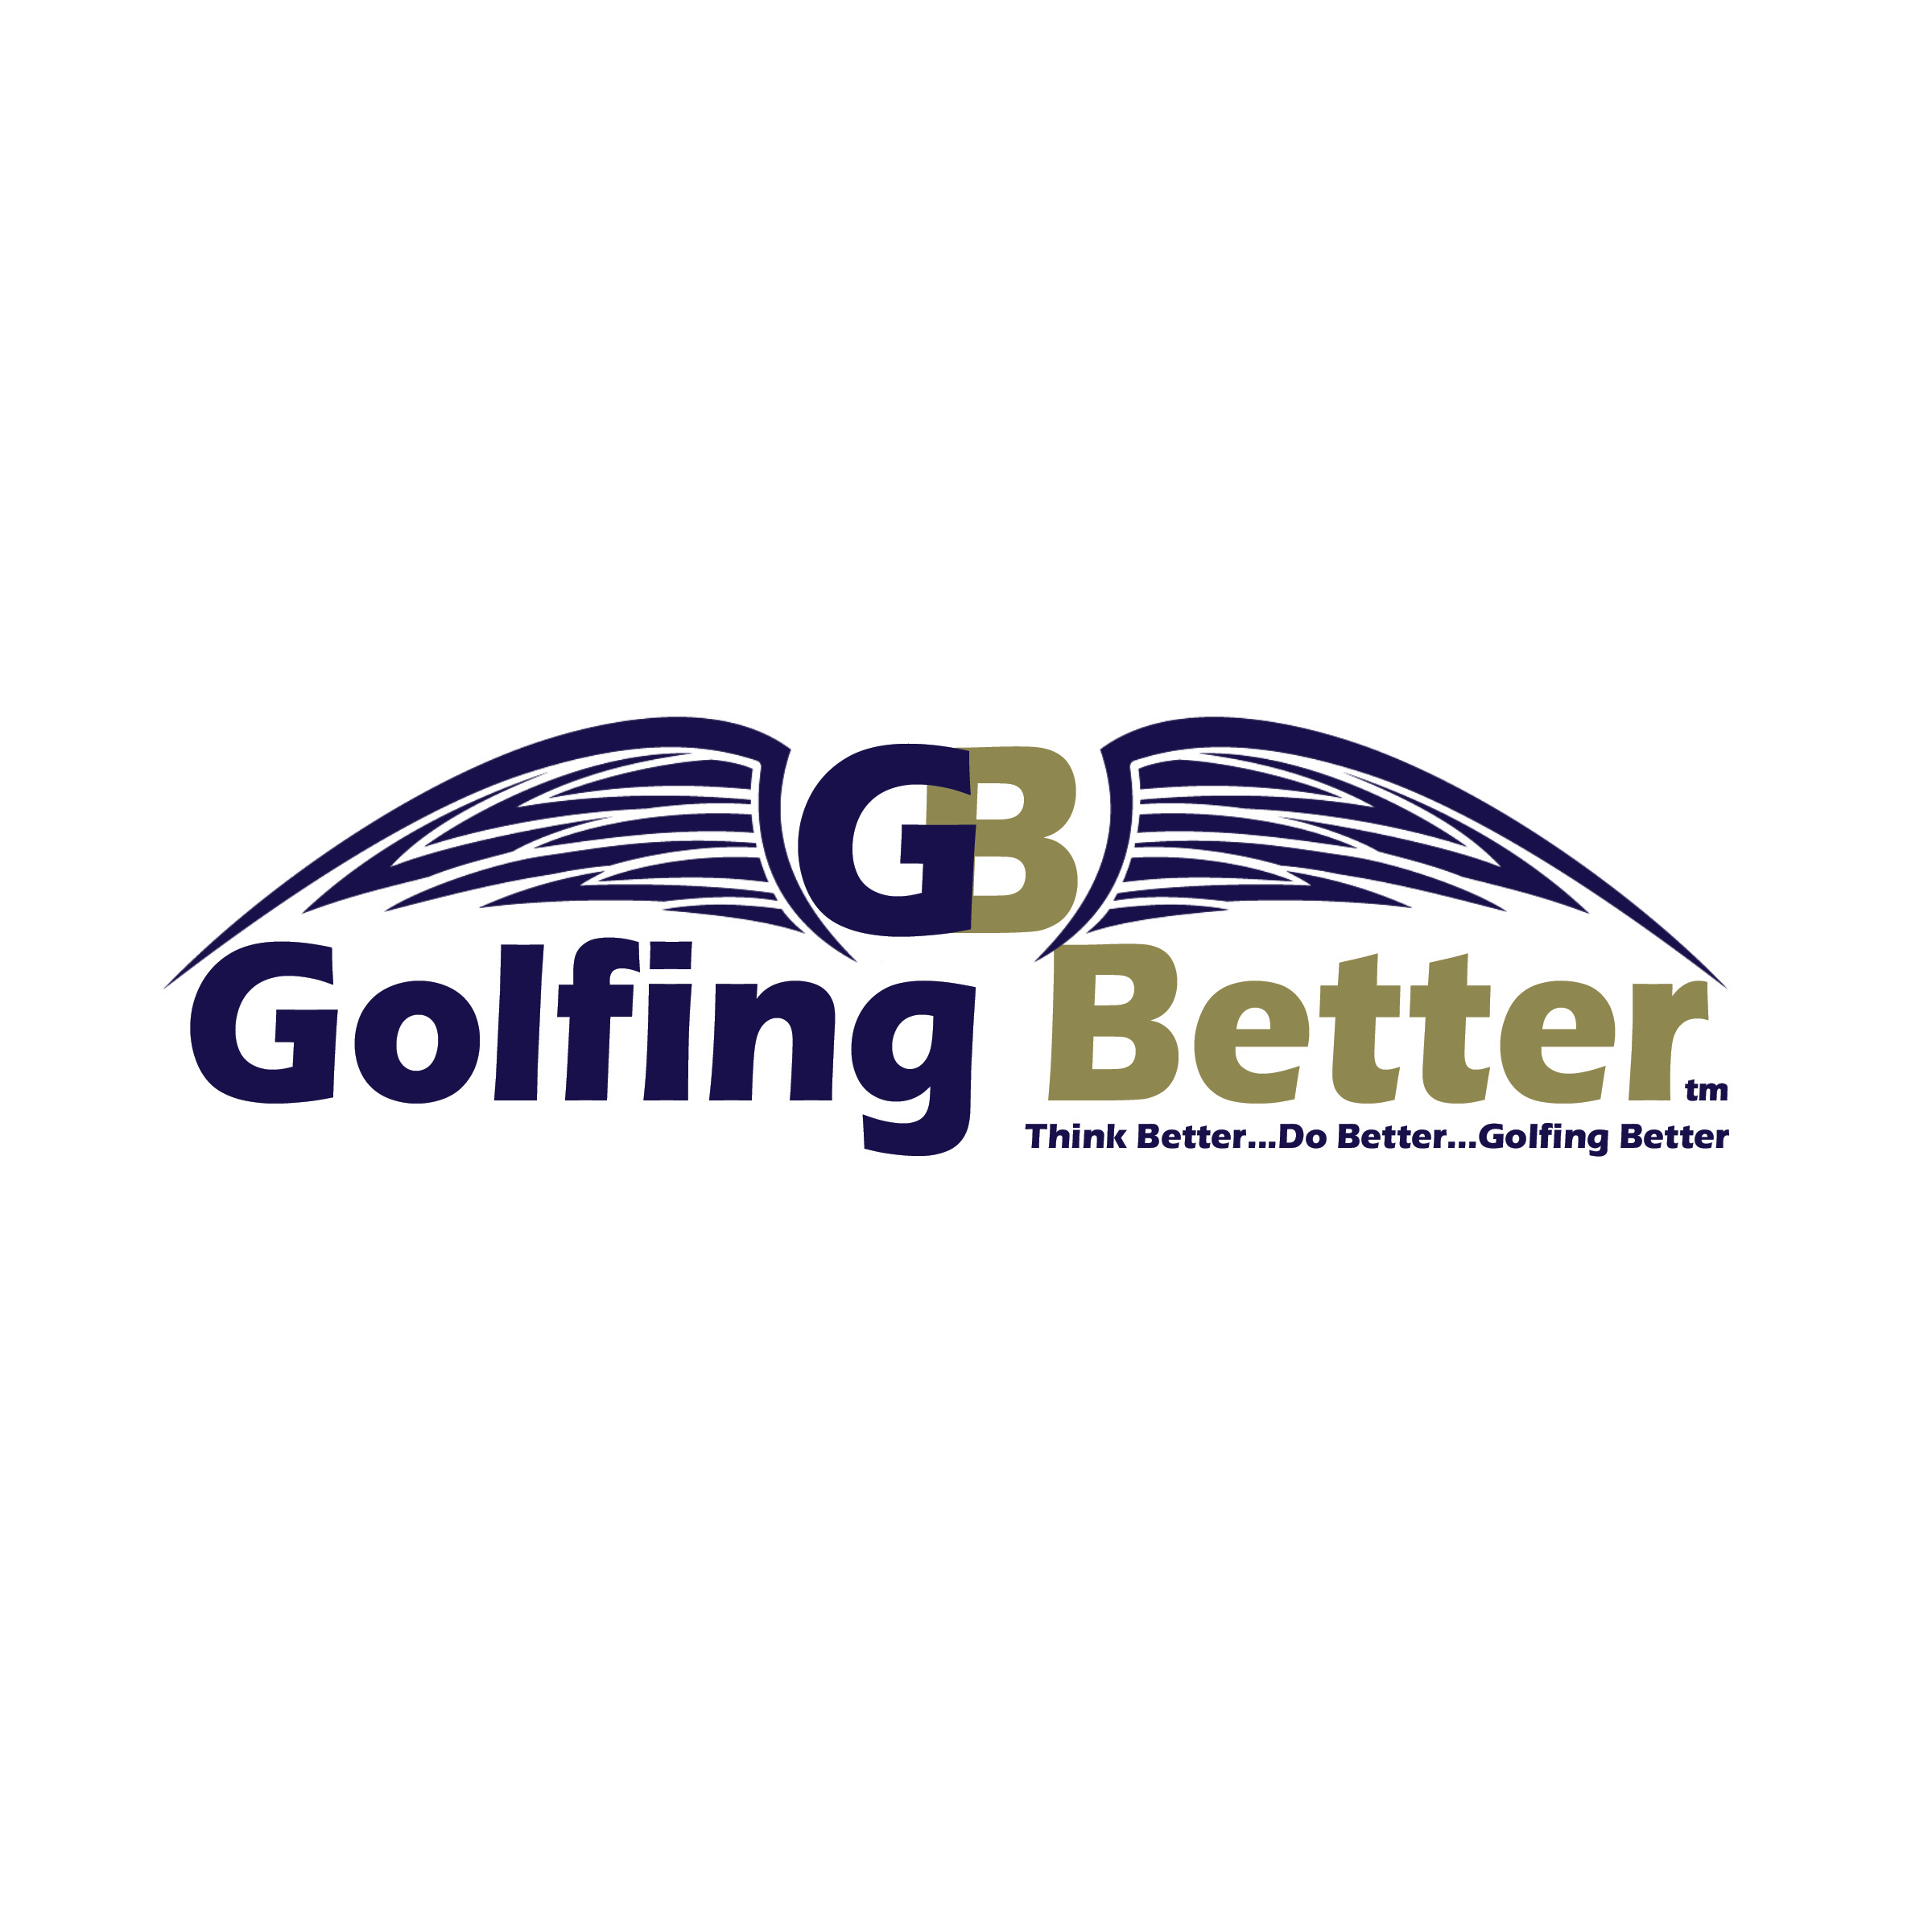 Golfing Better Llc